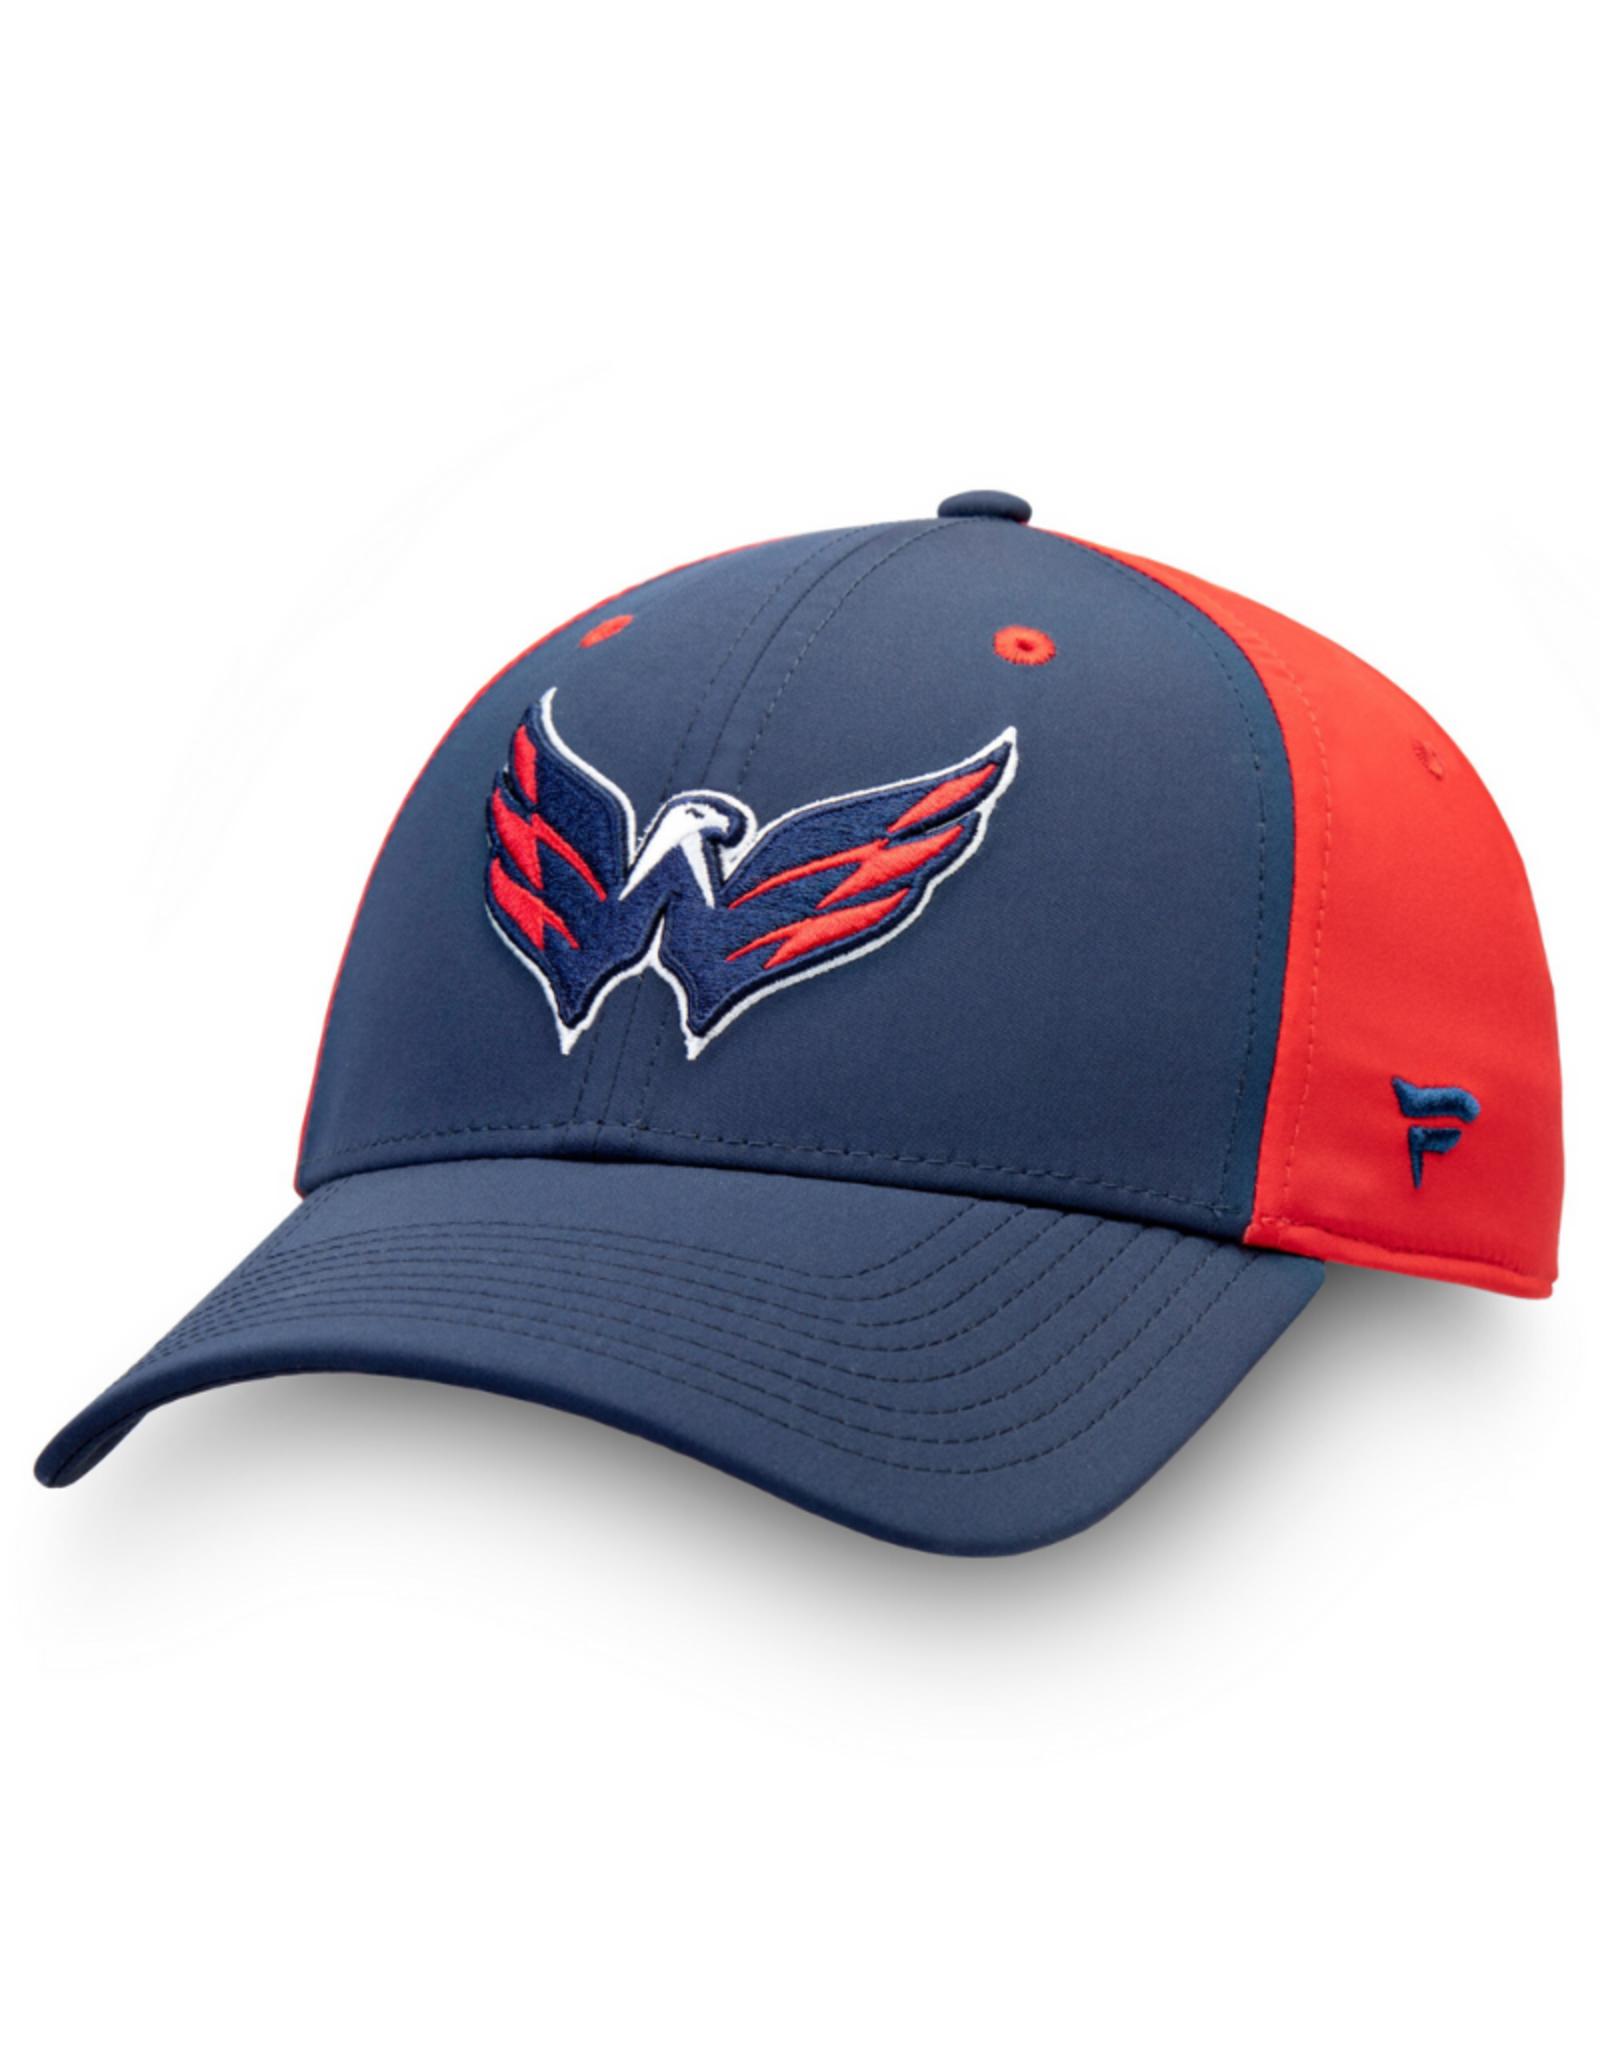 Fanatics Fanatics Men's Iconic Stretch Hat Wahington Capitals Navy/Red